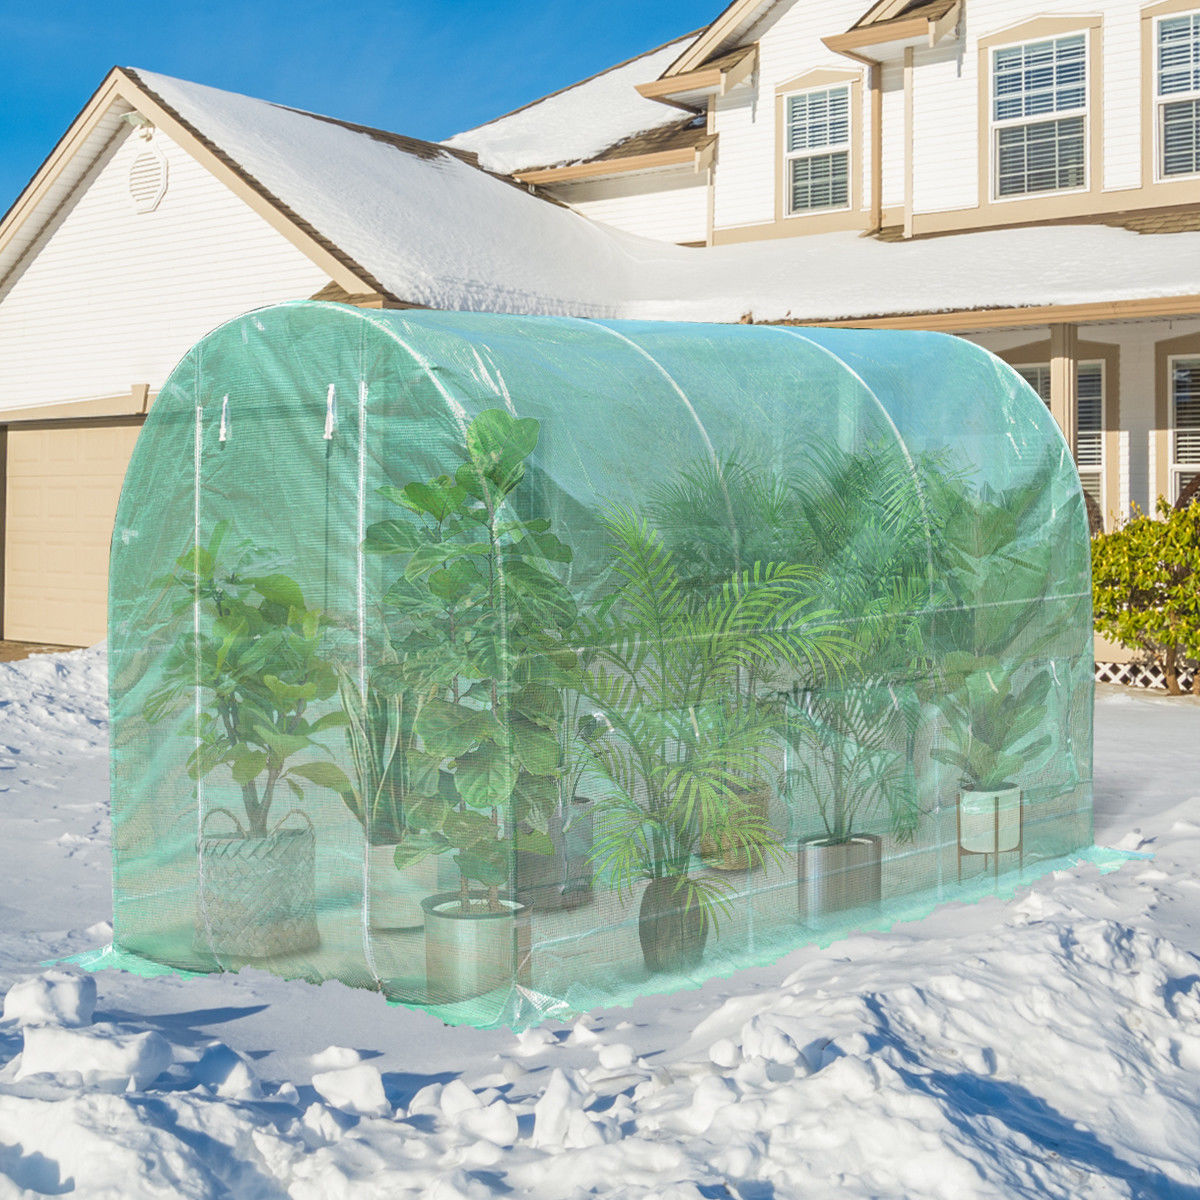 Costway 11.5'X 6.5'X6.5' Walk-in Greenhouse Steel Frame Backyard Grow Tents 6 Windows